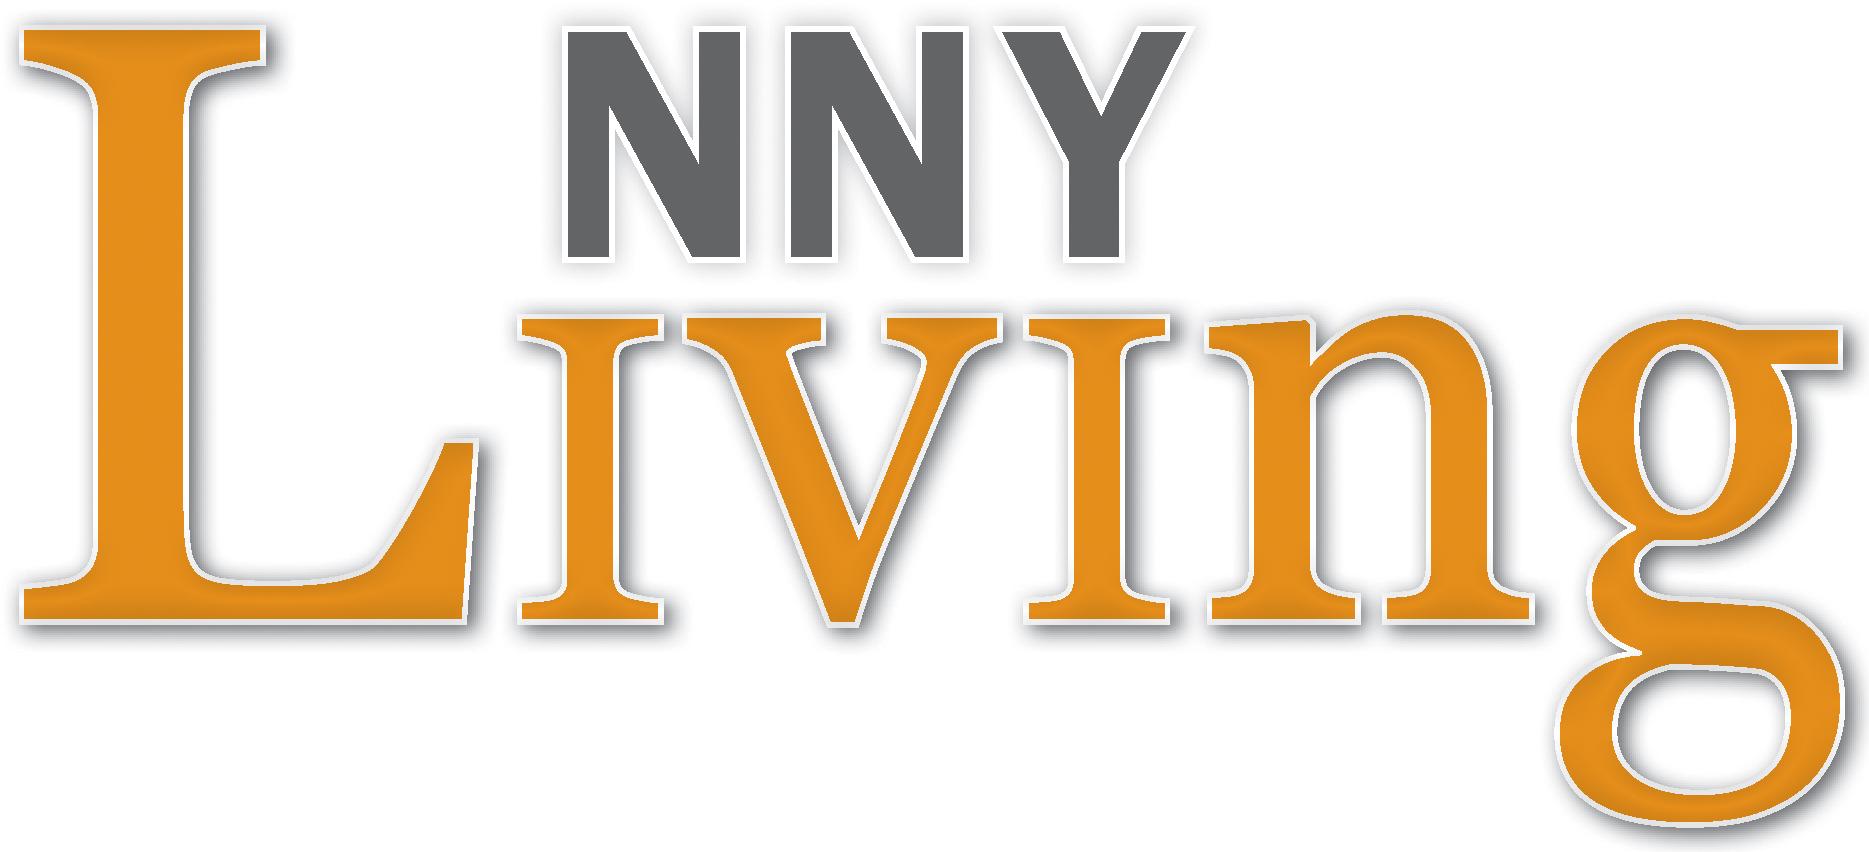 NNYLiving_flag.jpg